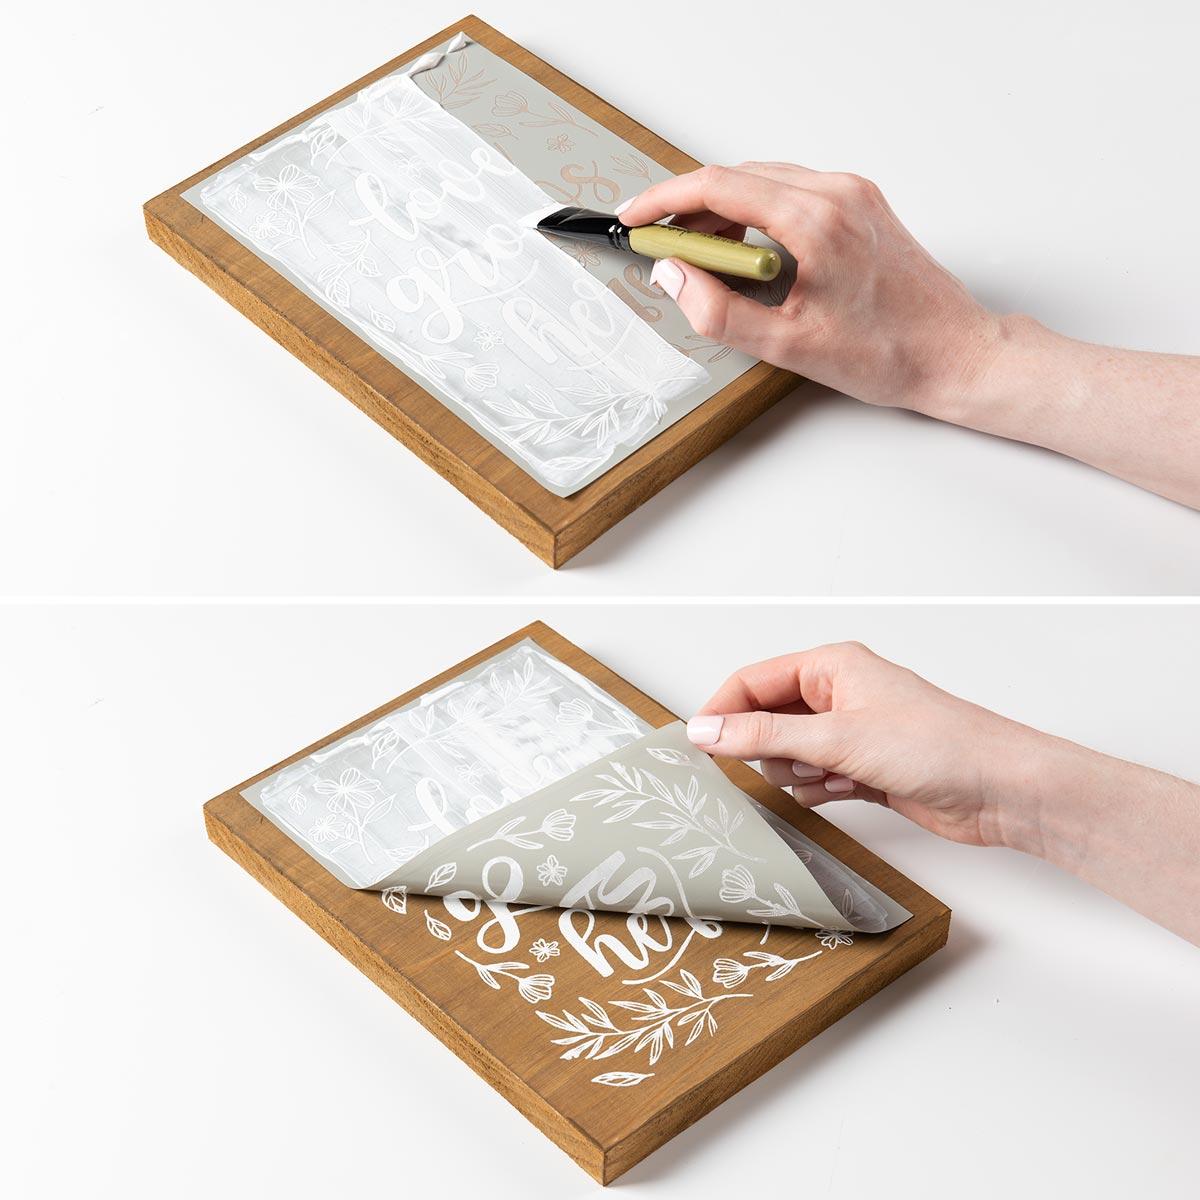 FolkArt ® Sign Shop™ Brush Set - Stencil Paste Brush Set, 2 pc. - 36353